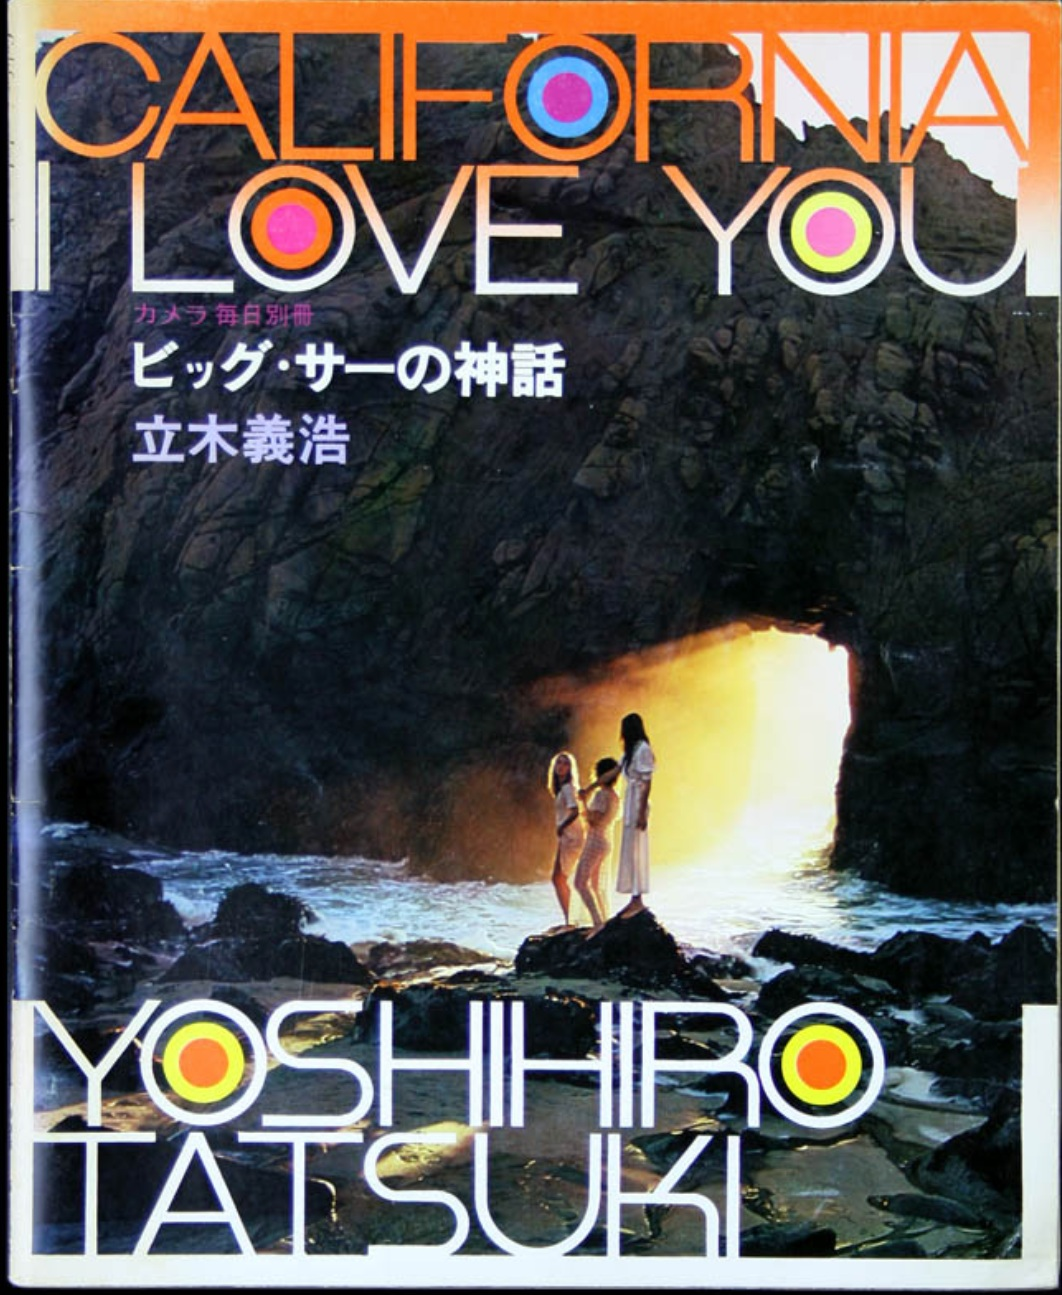 Editor-In-Chief of The Ingénue Magazine Jessie Lily Adams selects 'California I Love You' by photographer Yoshihiro Tatsuki